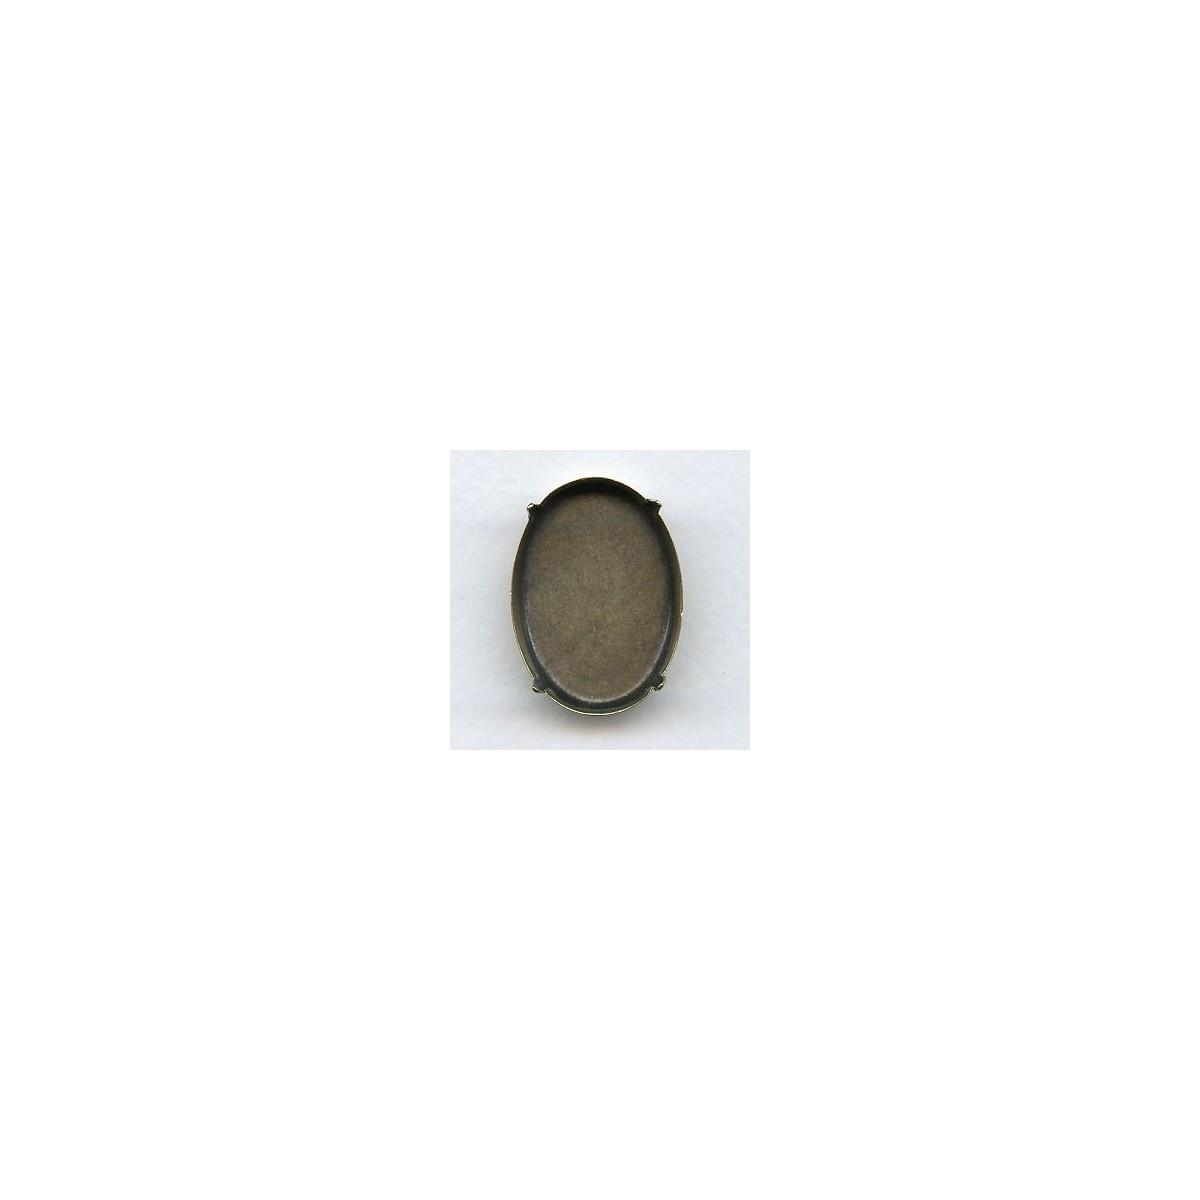 Oval Oxidized Brass Pronged Settings 30x22mm